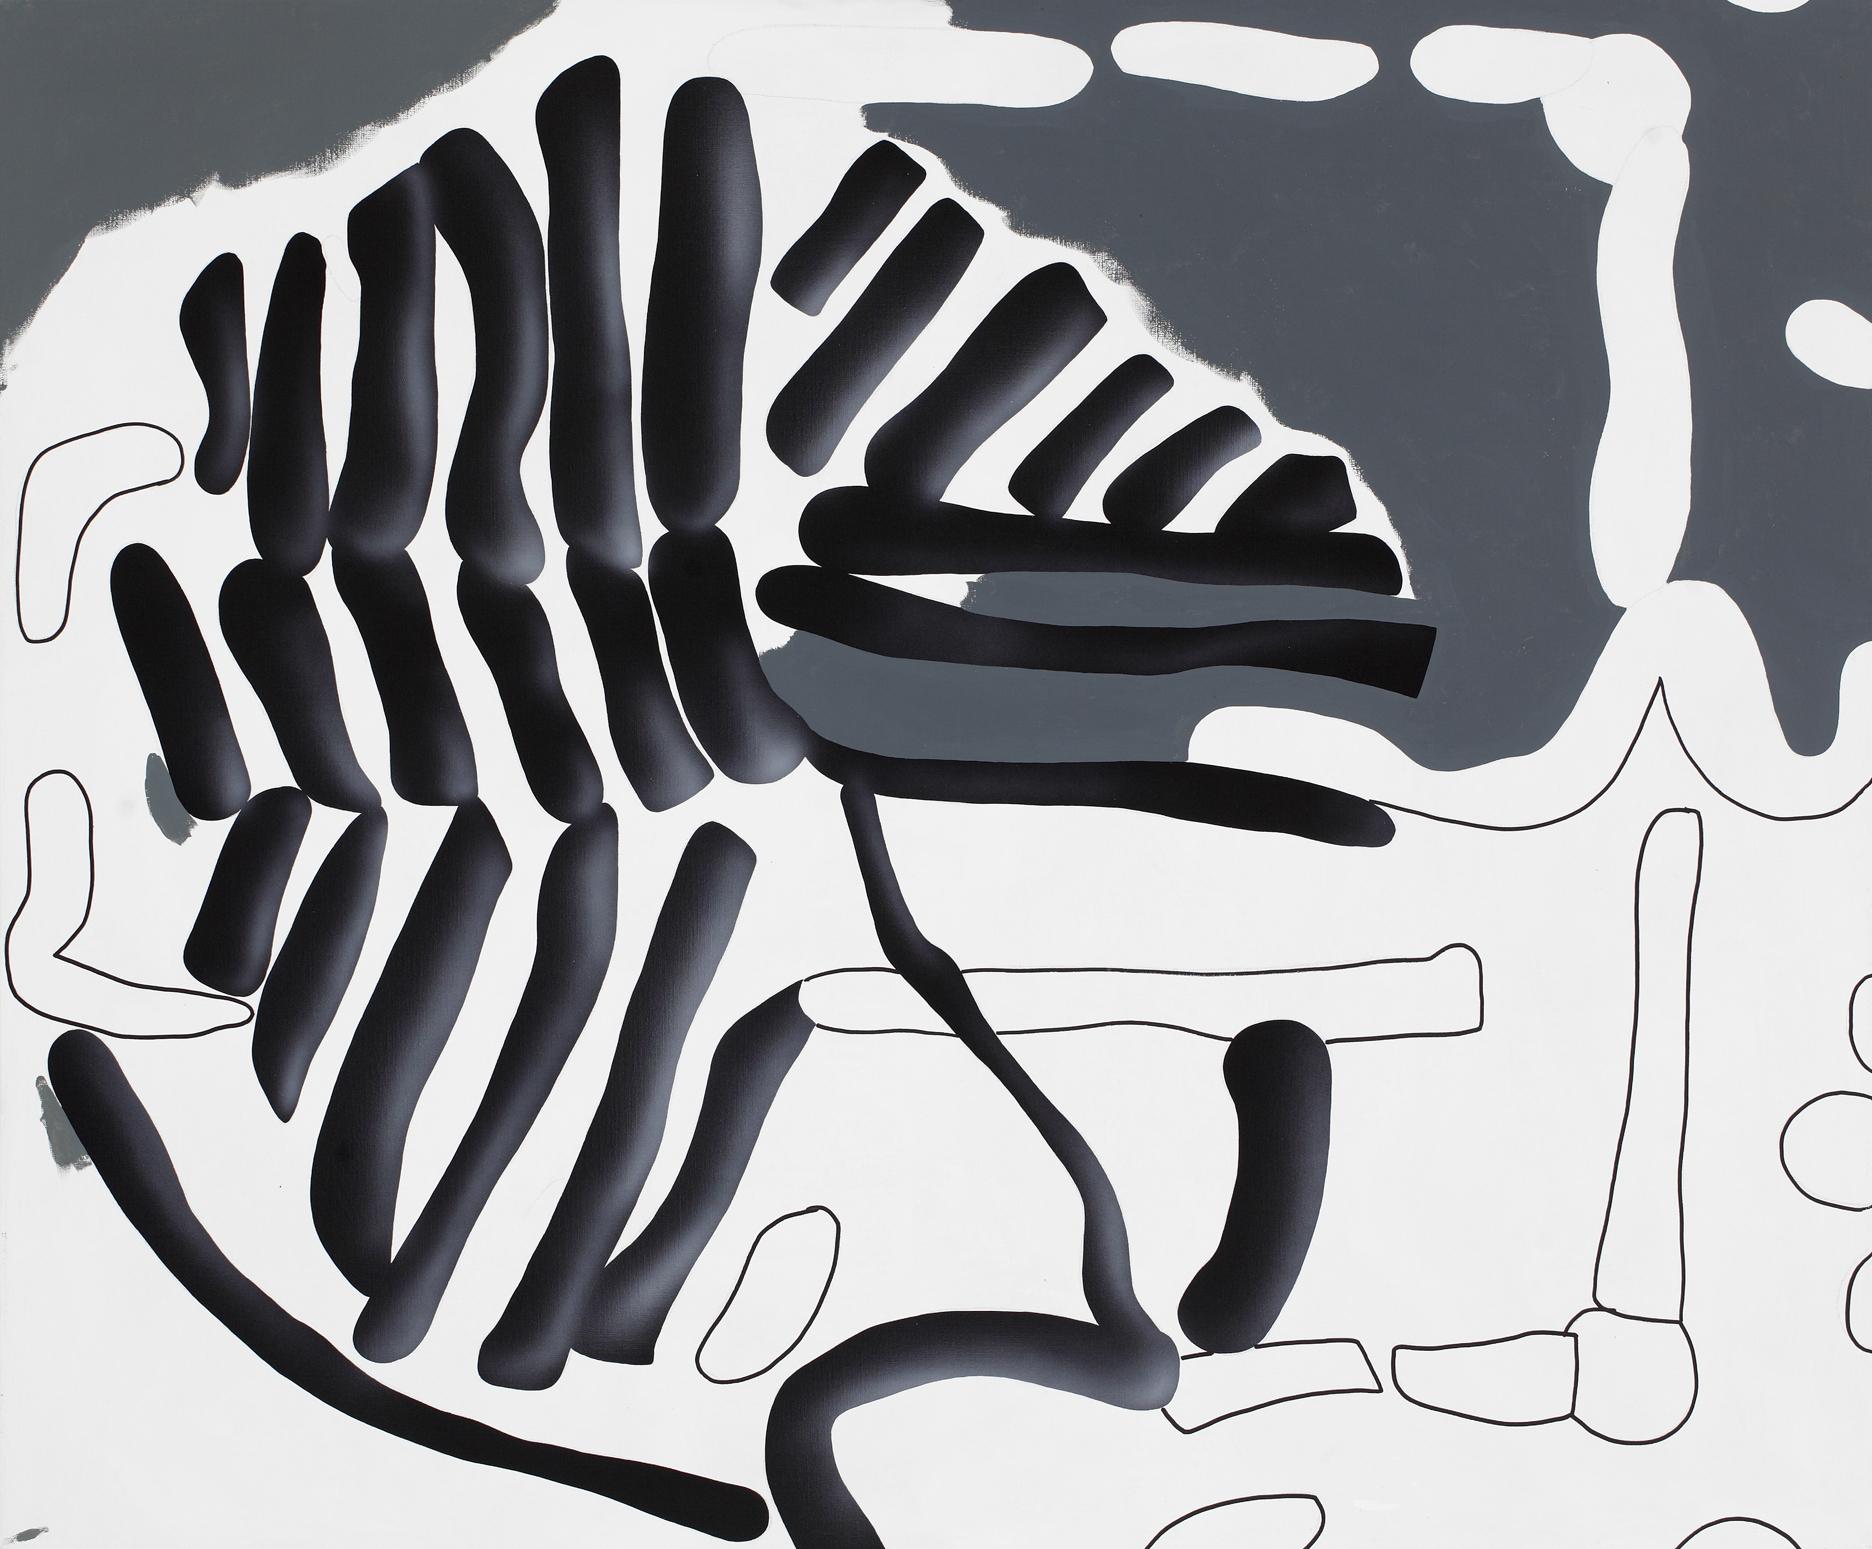 Circle I. 2011, acrylic on canvas, 120 x 140 cm